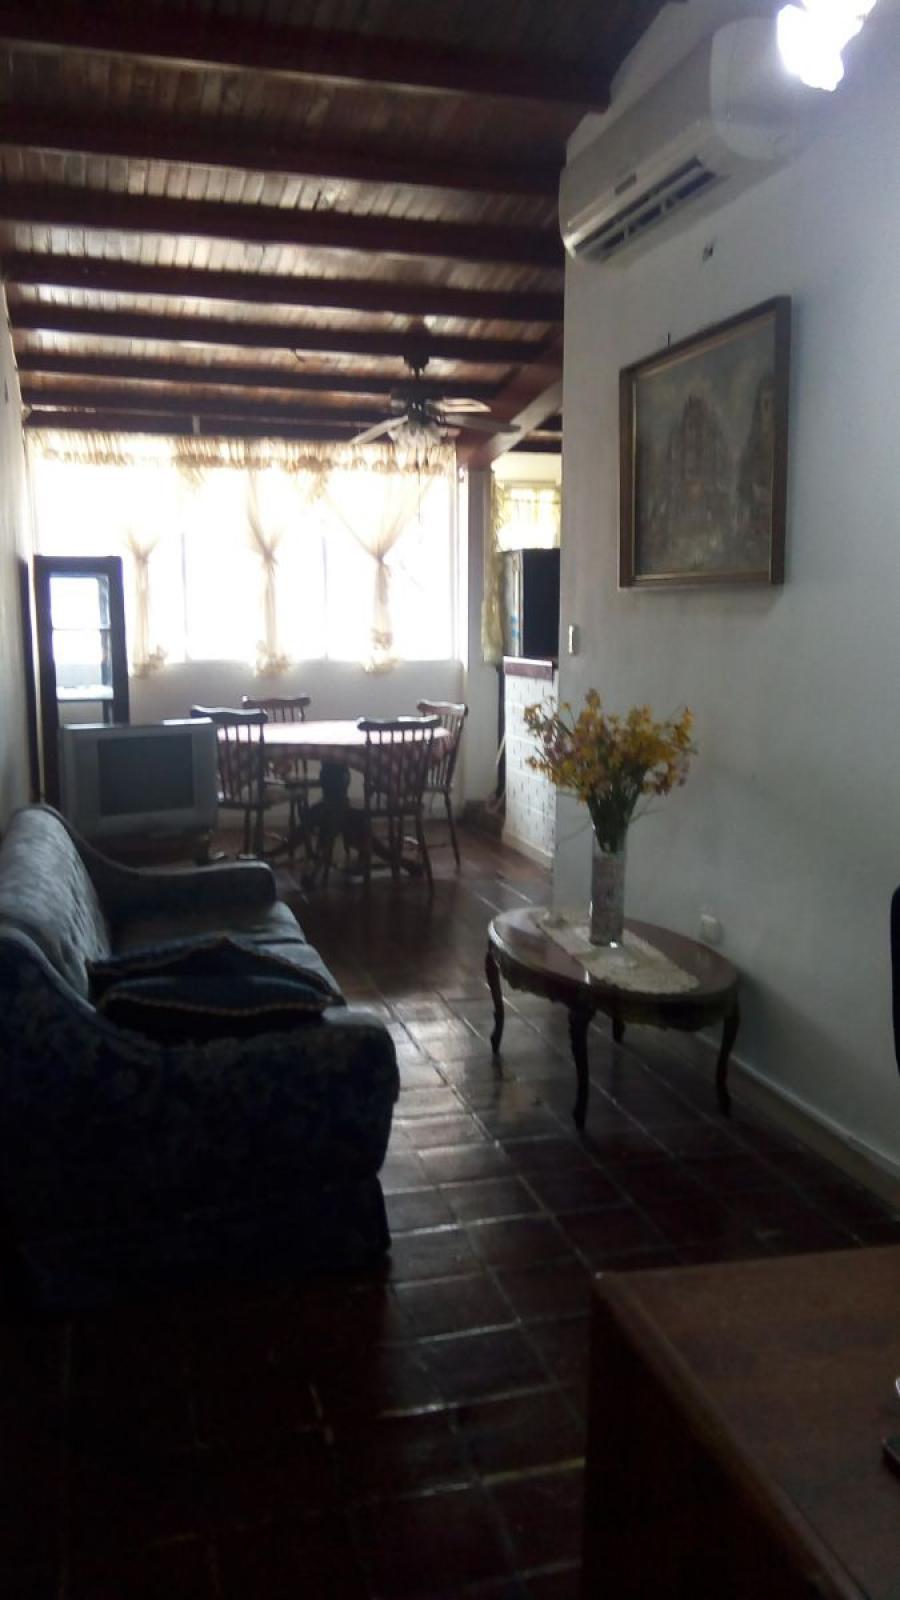 Foto Apartamento en Alquiler en Madre Maria de San Jose, Maracay, Aragua - U$D 280 - APA112729 - BienesOnLine